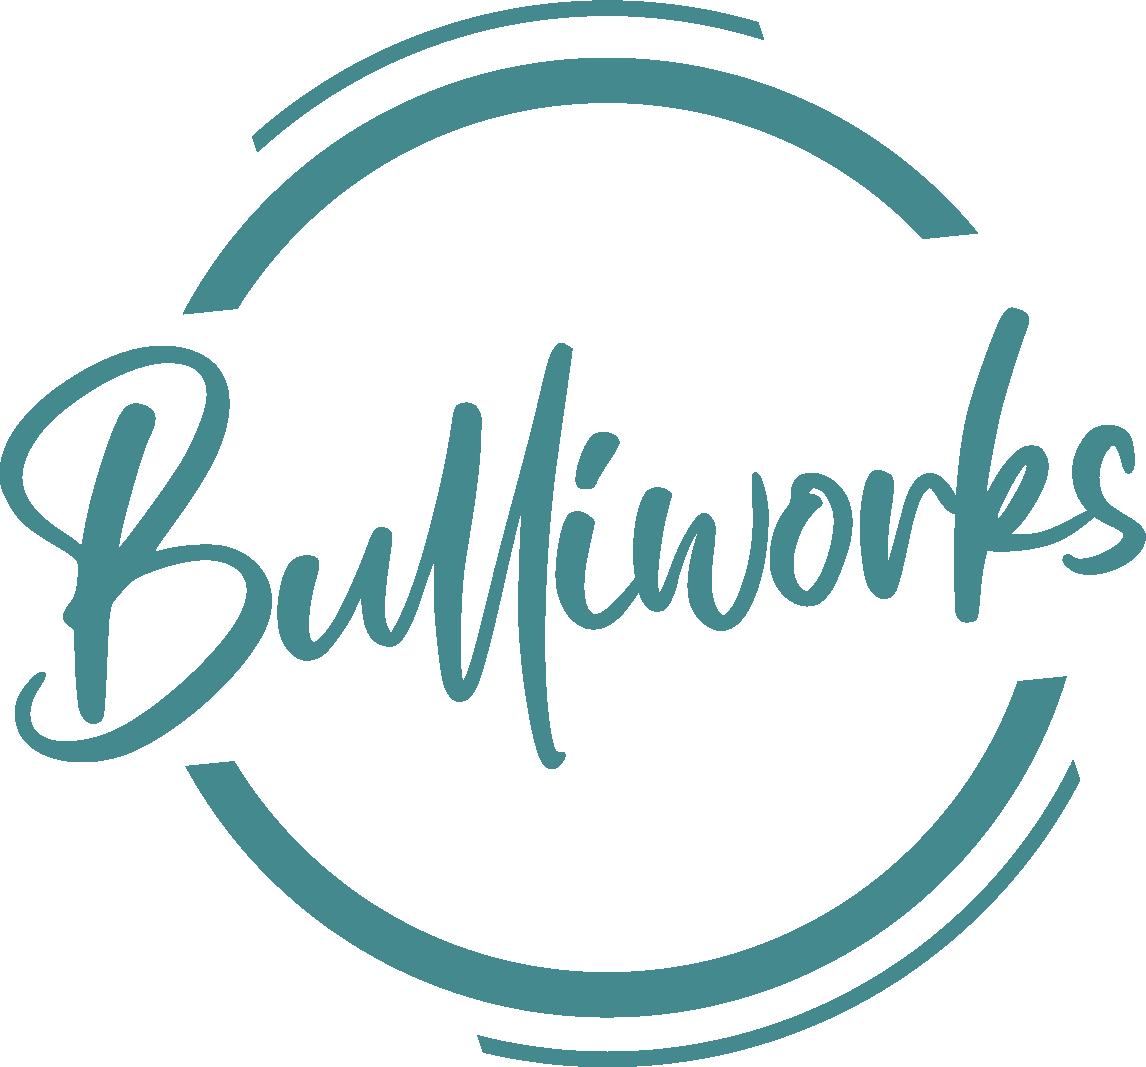 Bulliworks